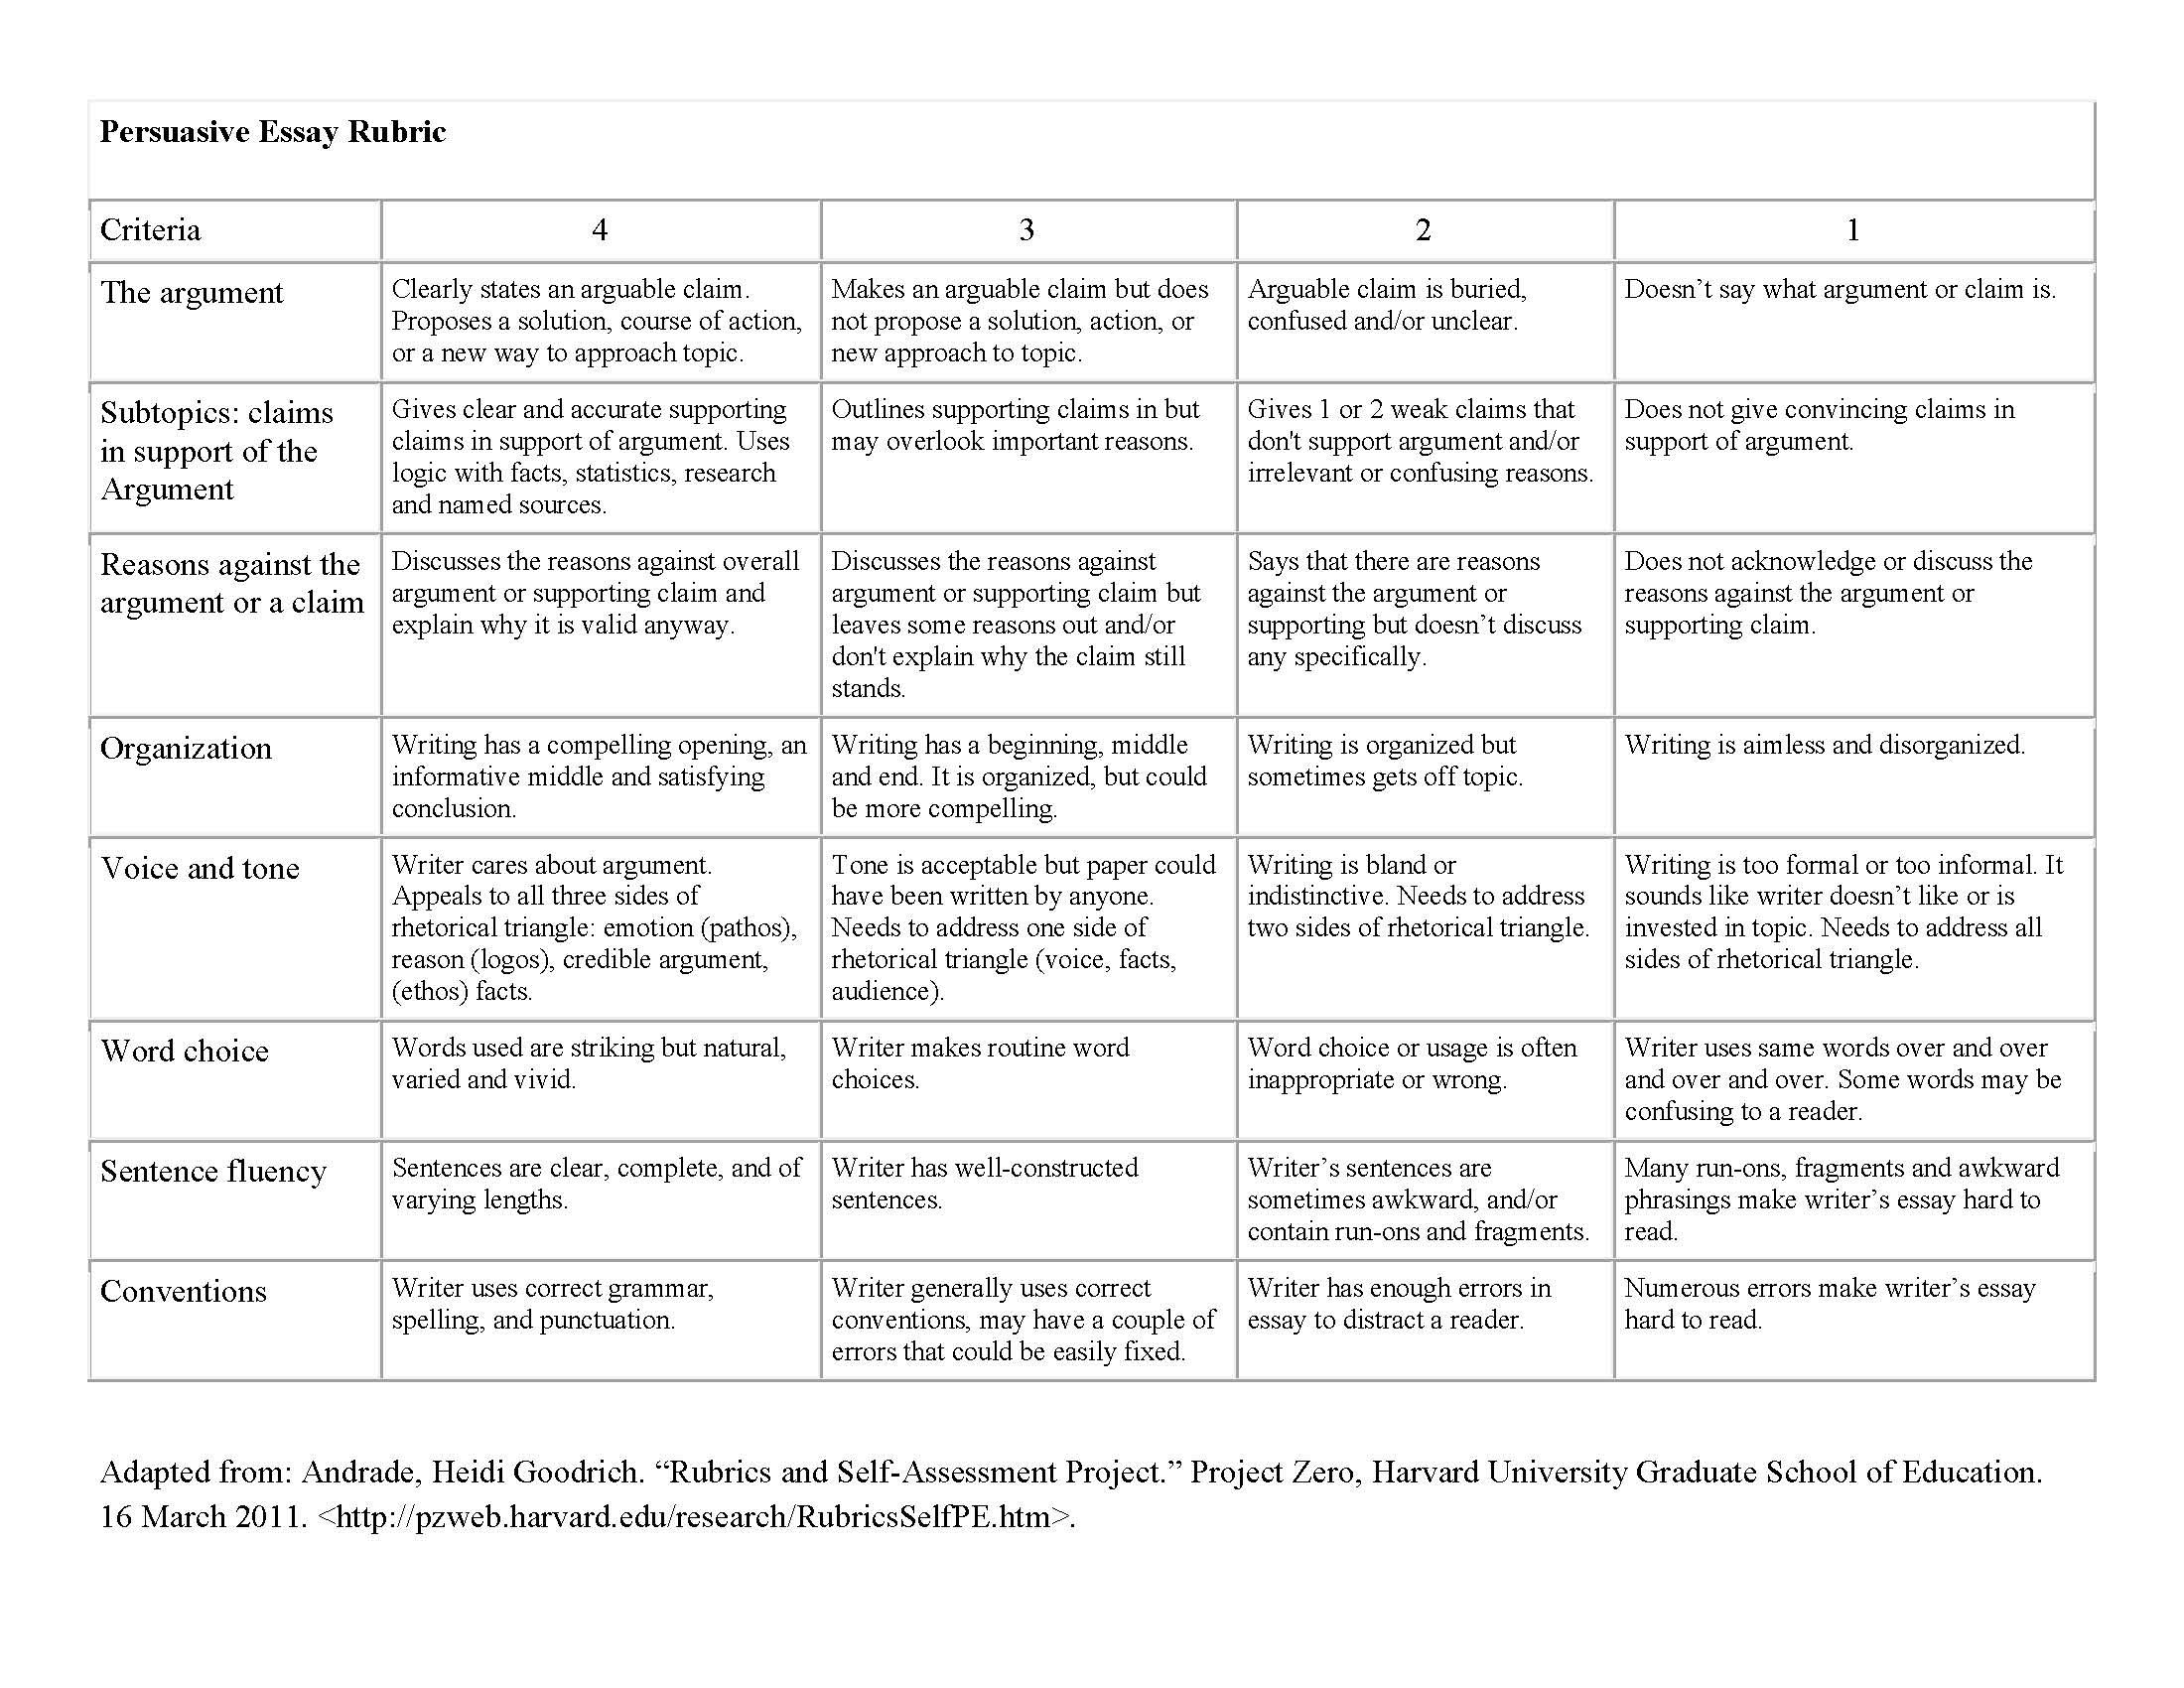 004 Handout Persuasive Essaycbu003d Example Stunning Essay Rubric Argumentative Grade 10 8th Doc Middle School Pdf Full